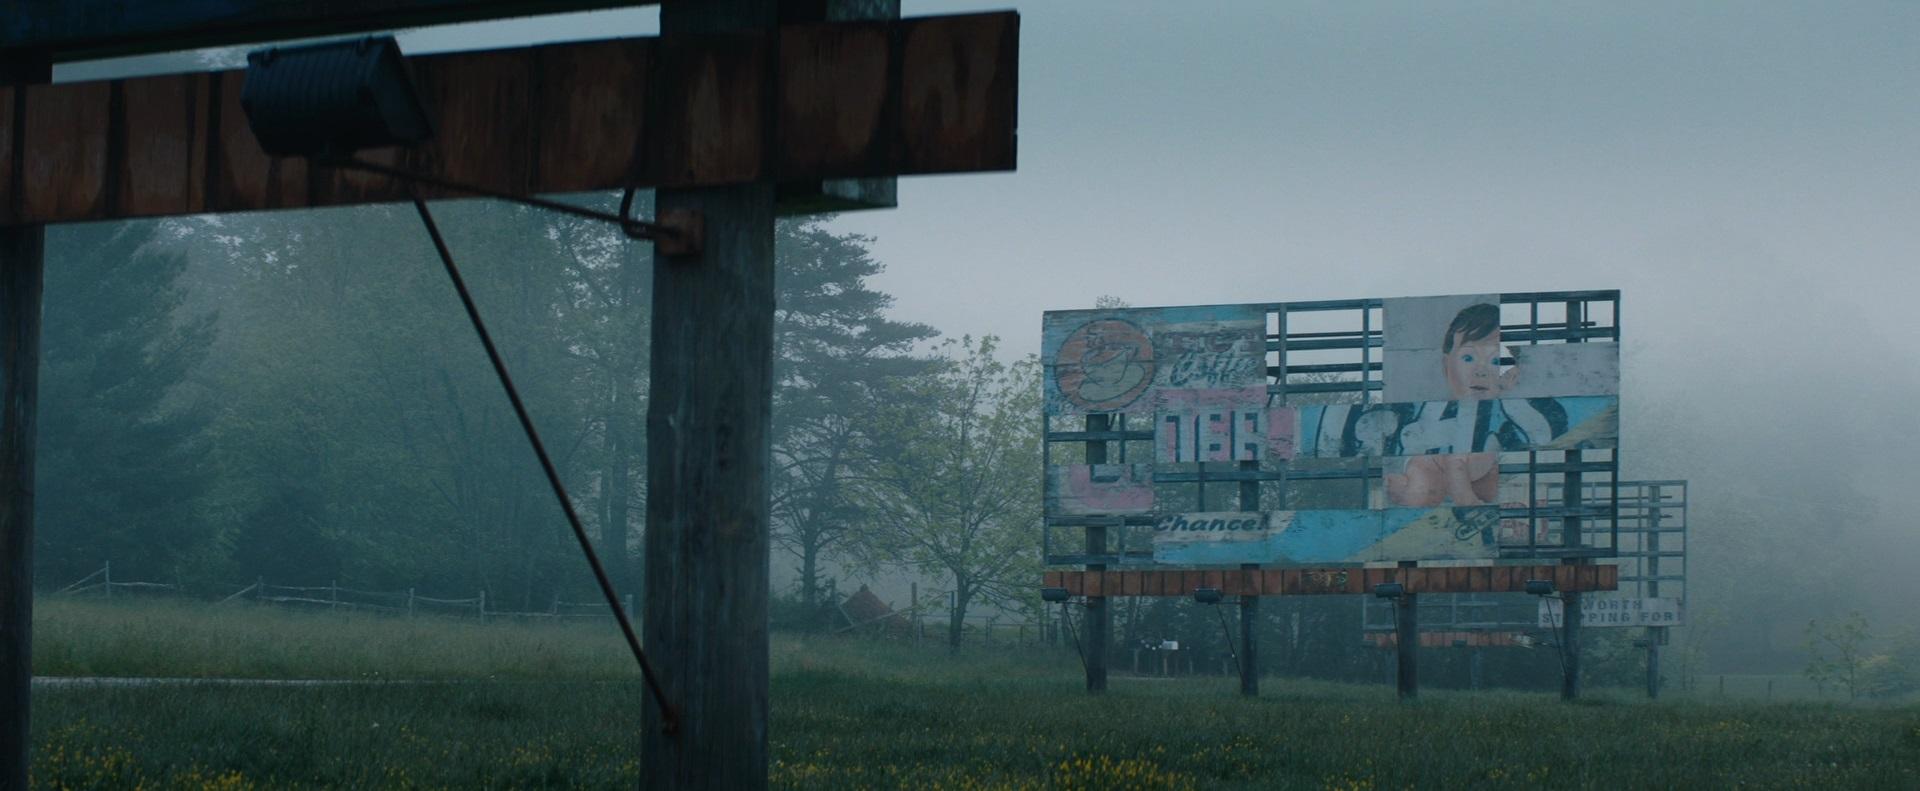 Рецензия на фильм «Три билборда на границе Эббинга, Миссури». - Изображение 2